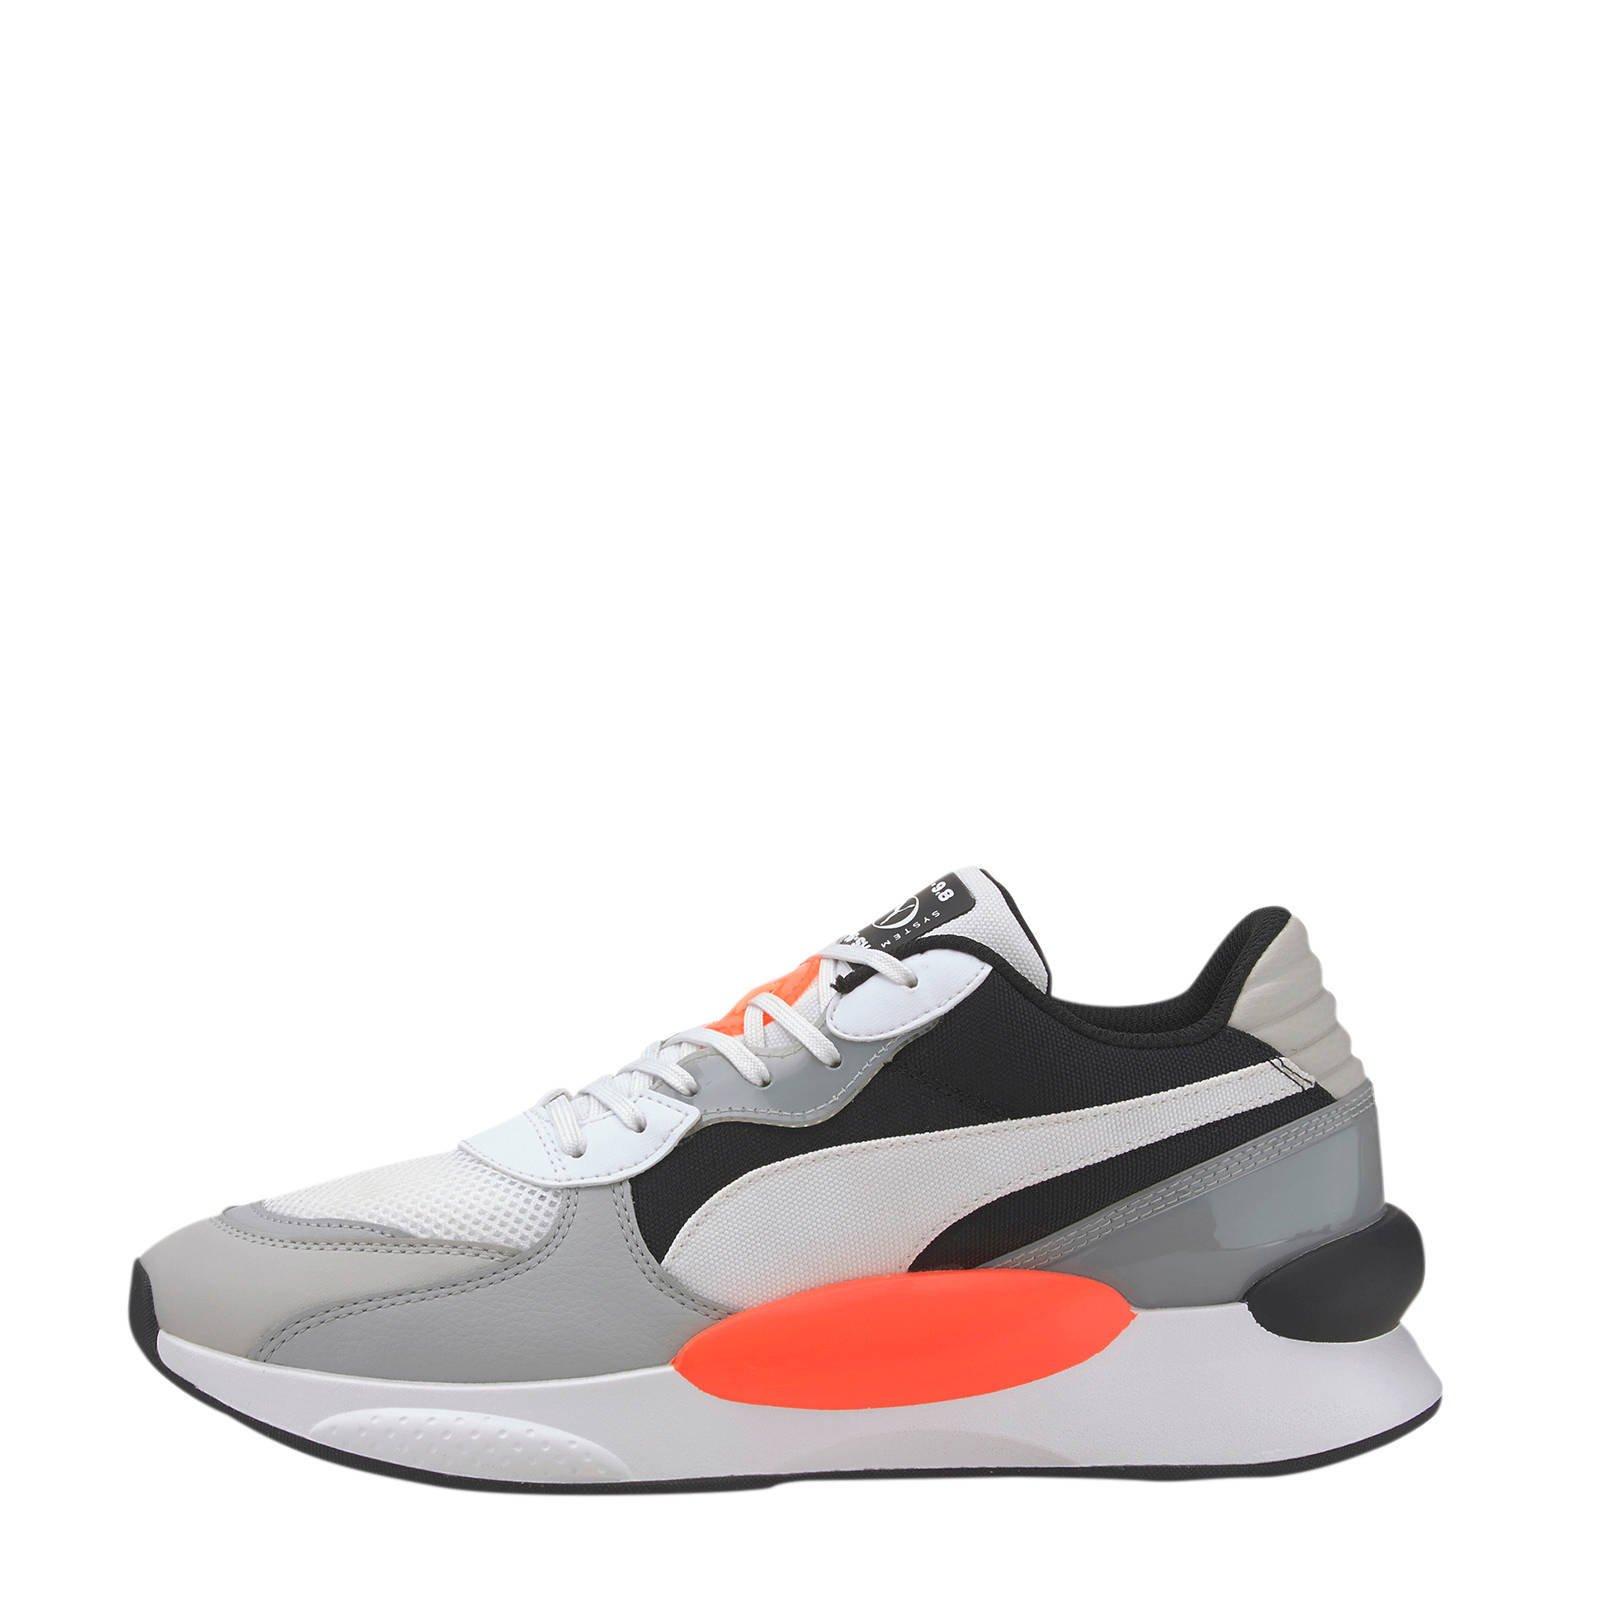 Puma RS 9.8 FRESH sneakers lichtrijs | wehkamp